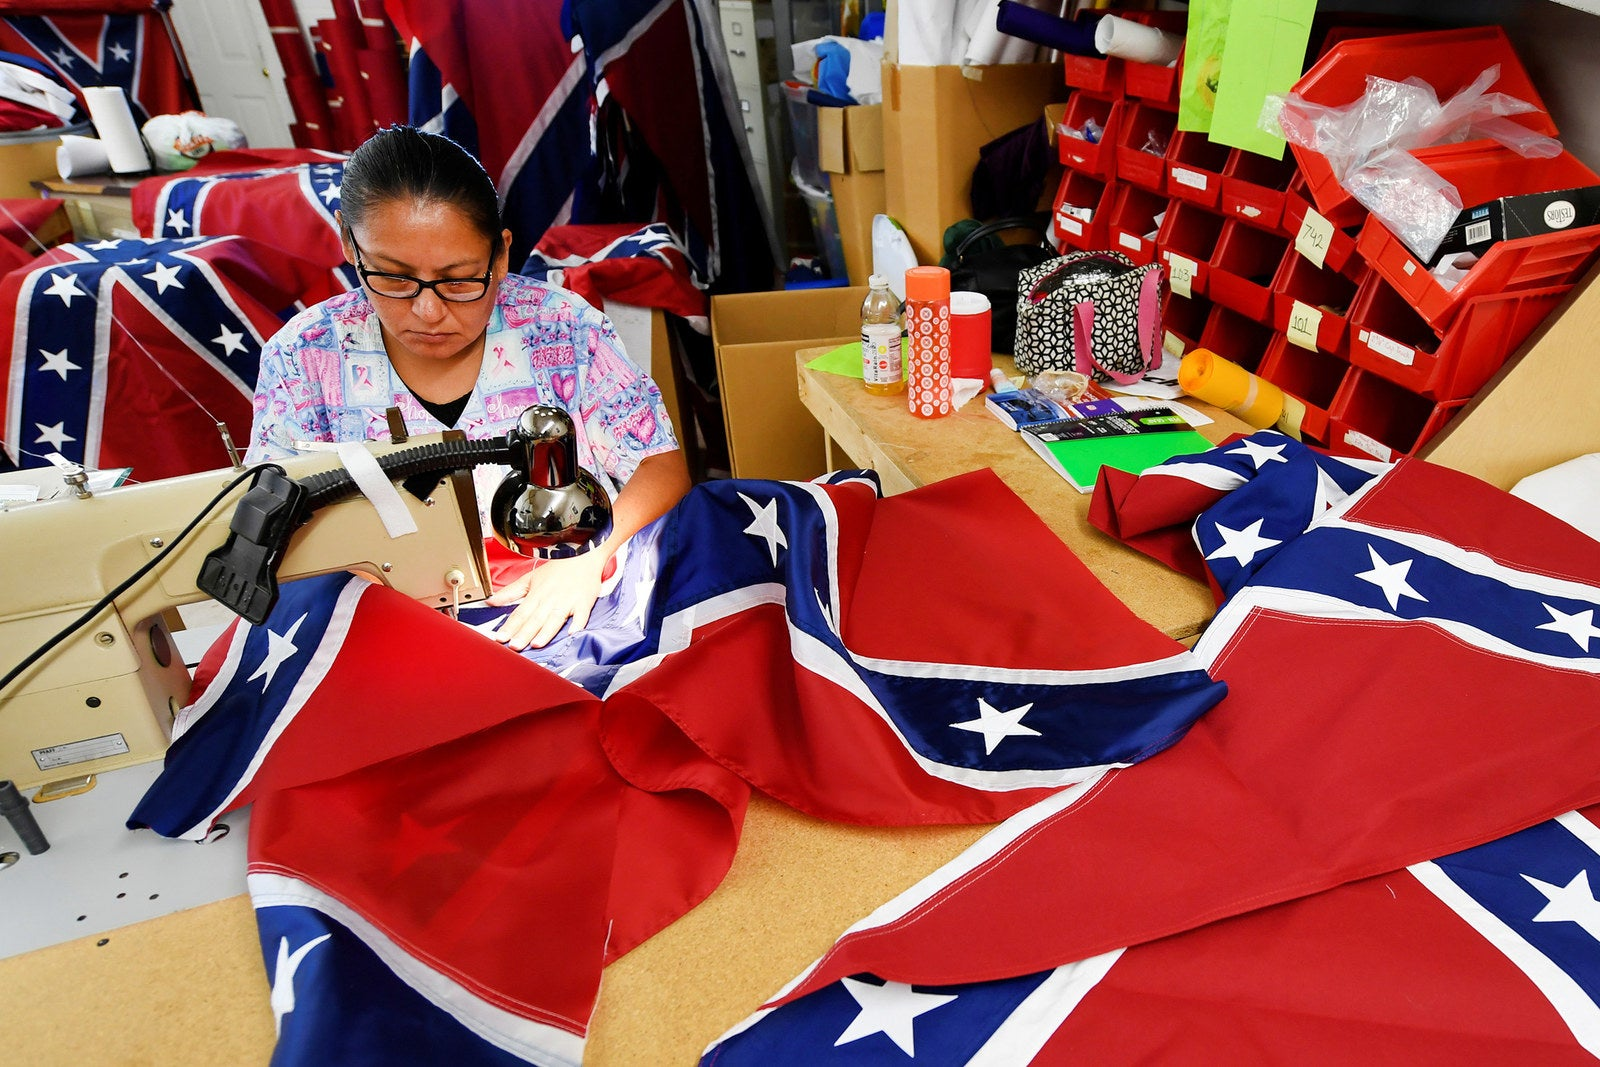 Blanca Hernandez sews stars on a Confederate battle flag in the Alabama Flag & Banner shop in Huntsville, Alabama, on Aug. 24.